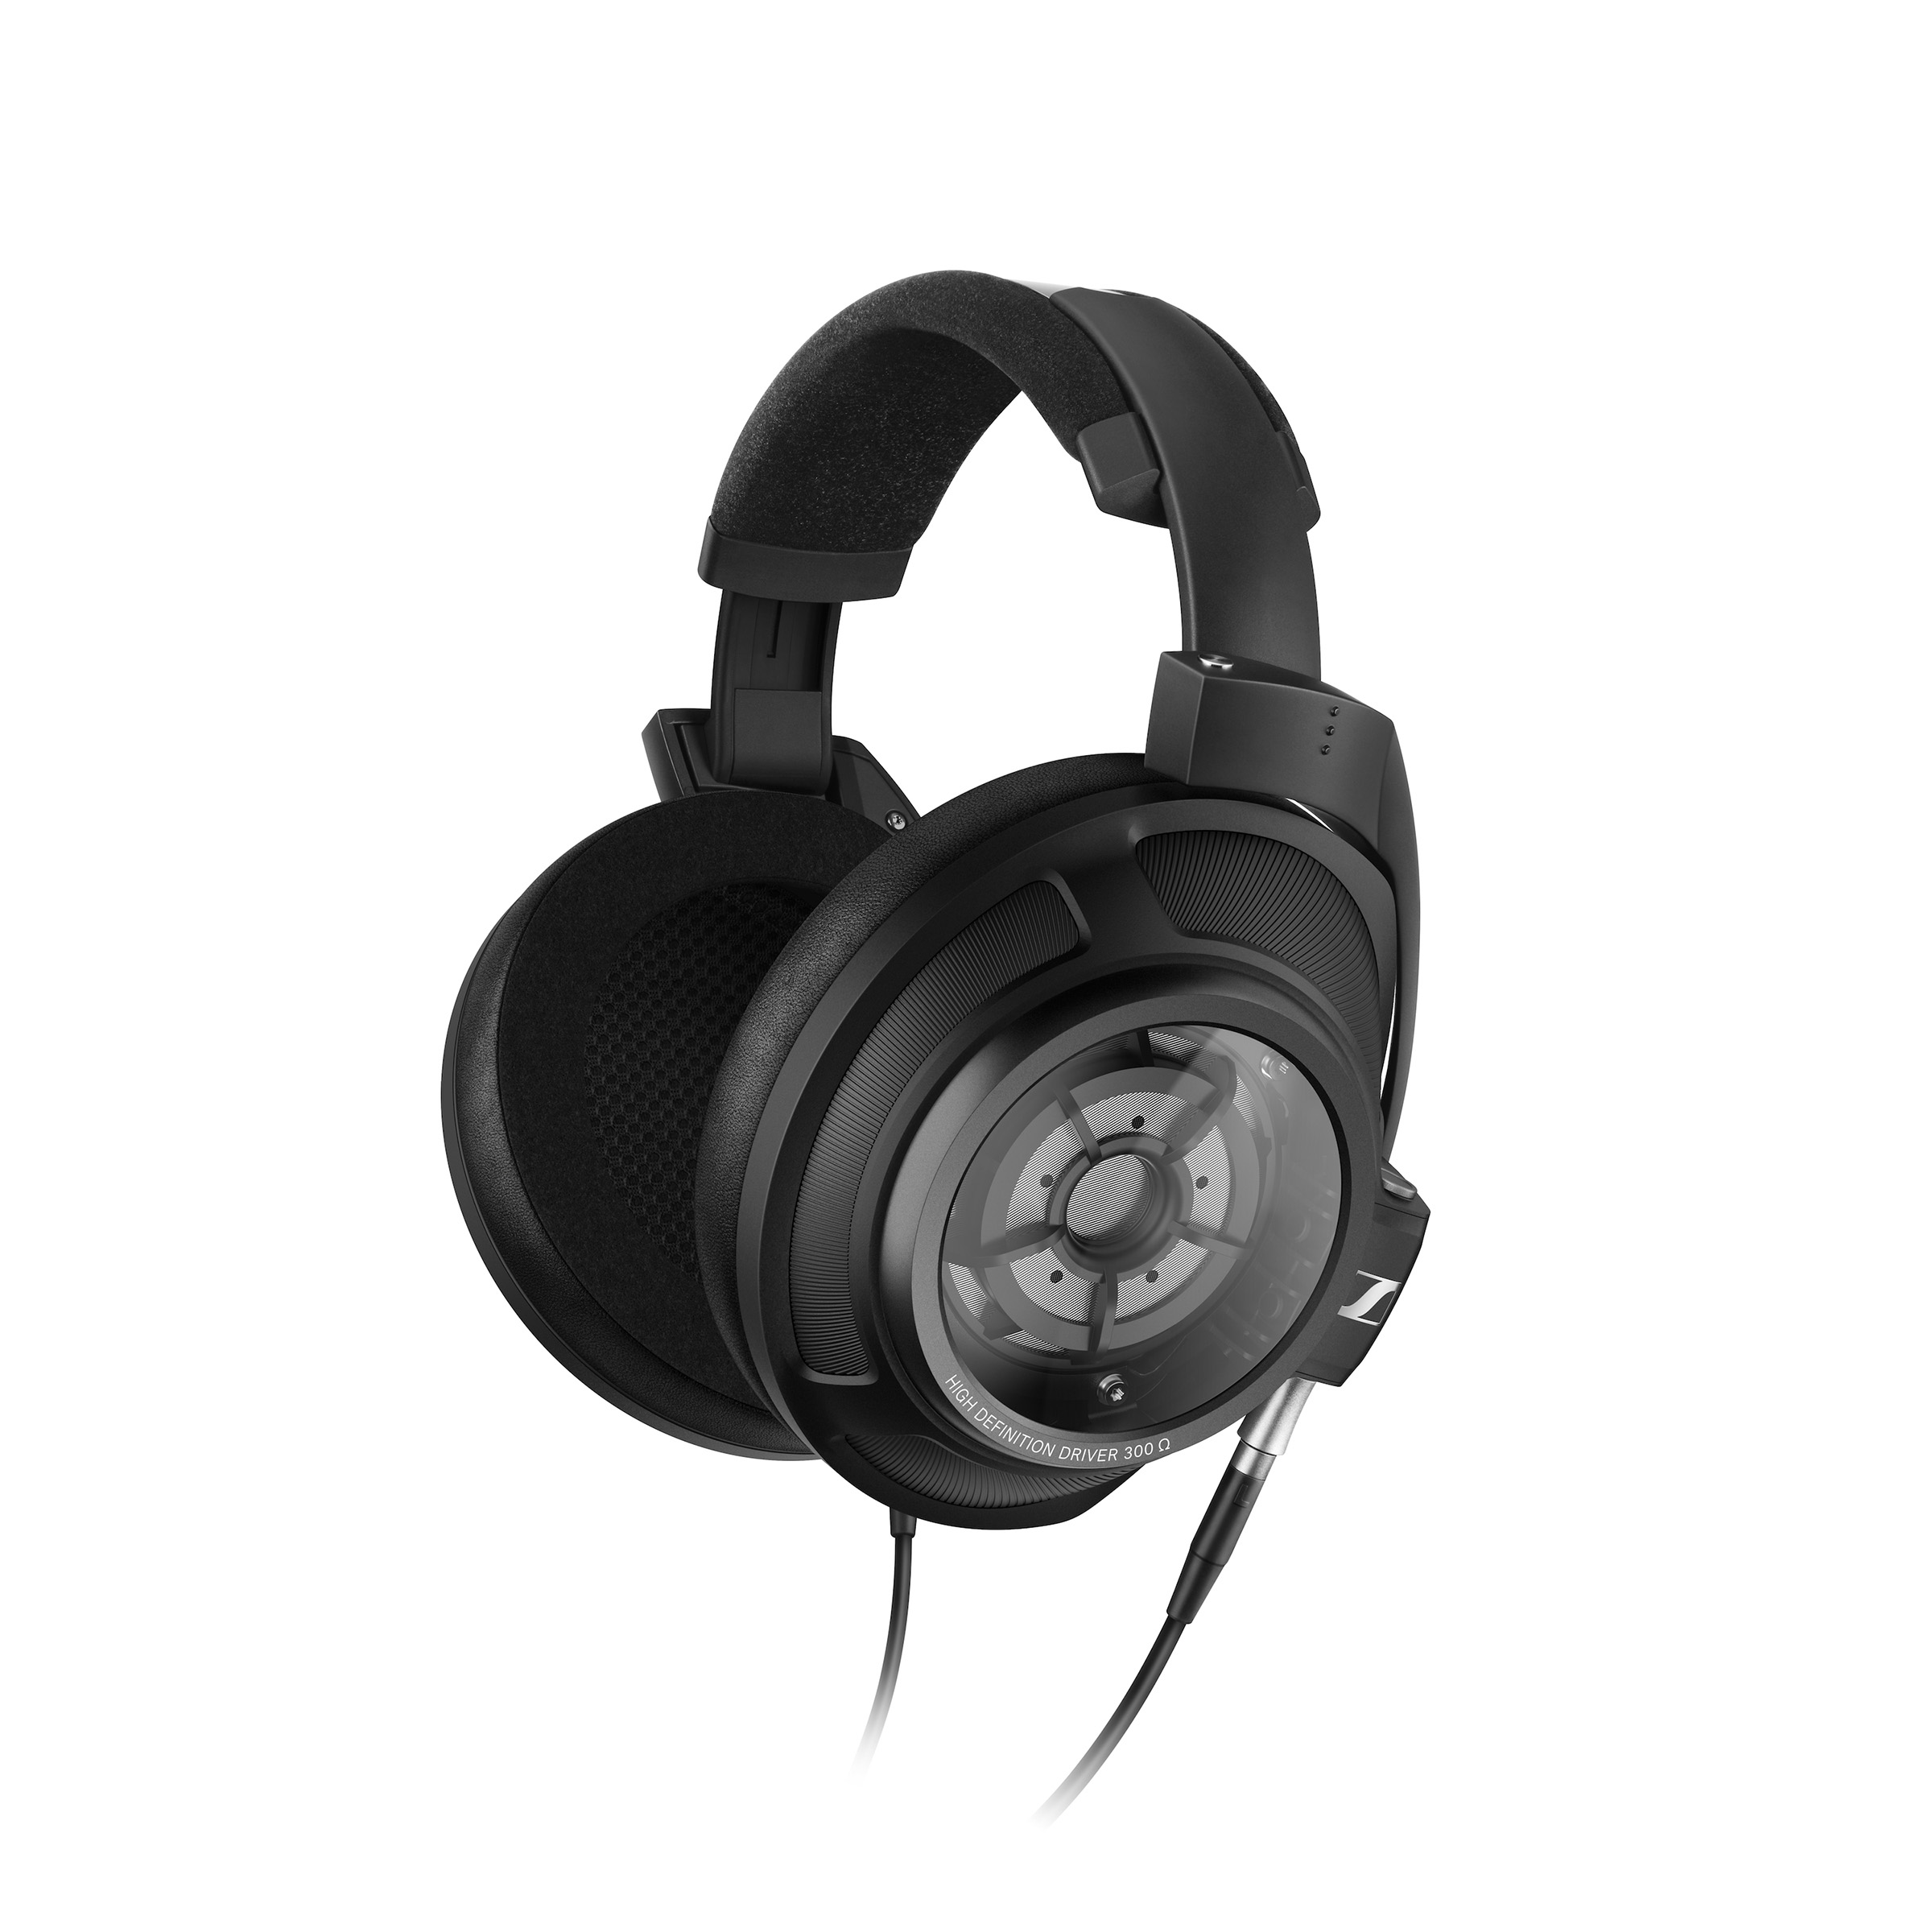 Sennheiser announces HD 820 closed-back headphones